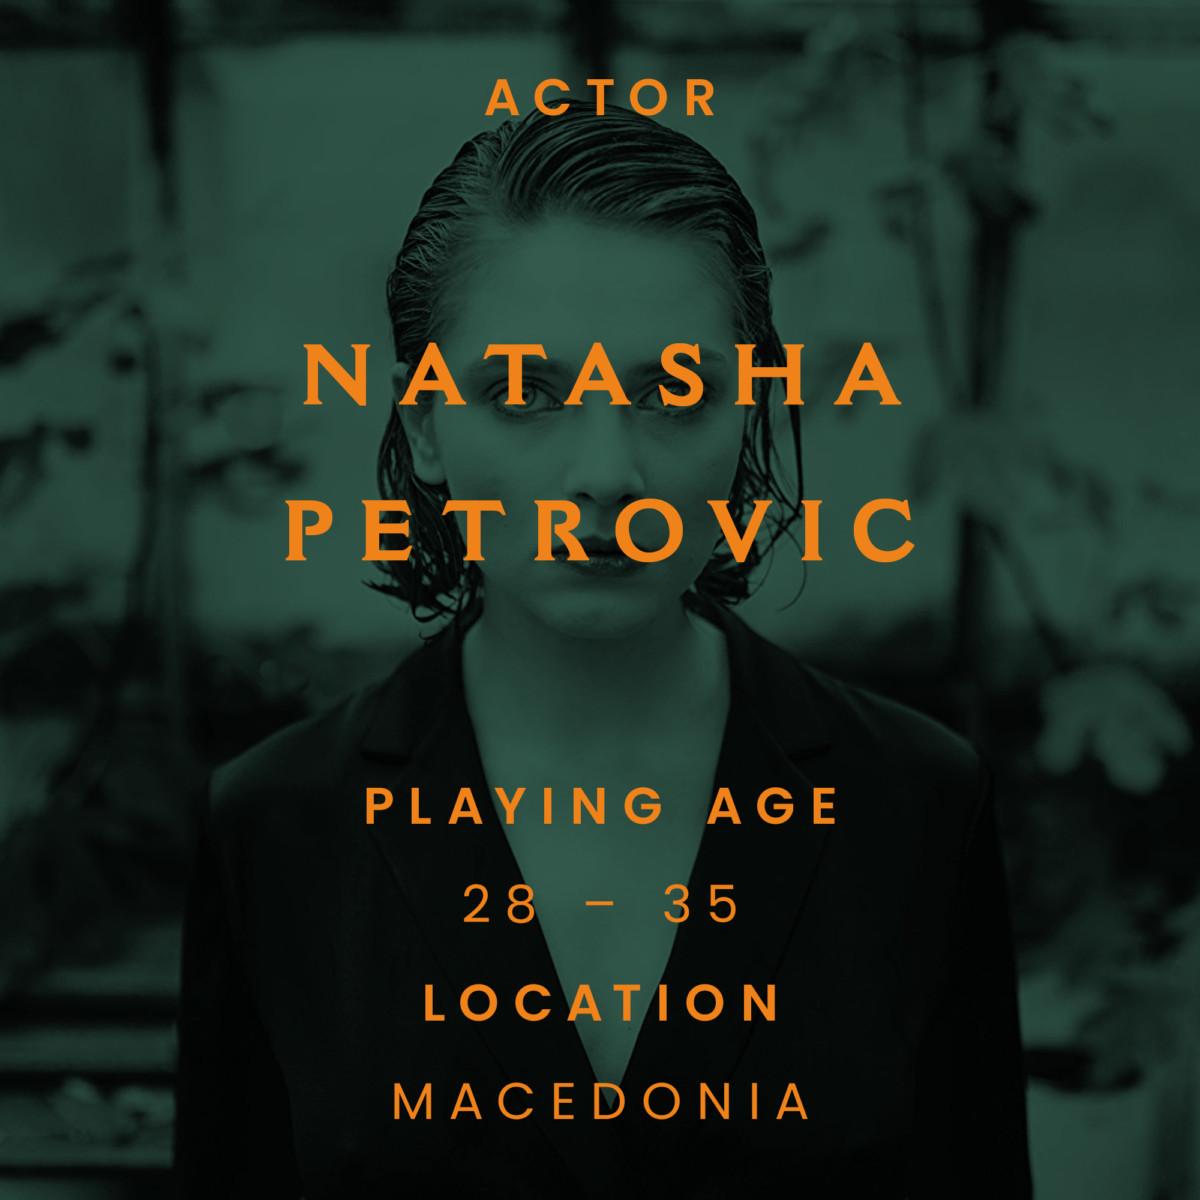 Natasha petrovic, actor, Macedonia